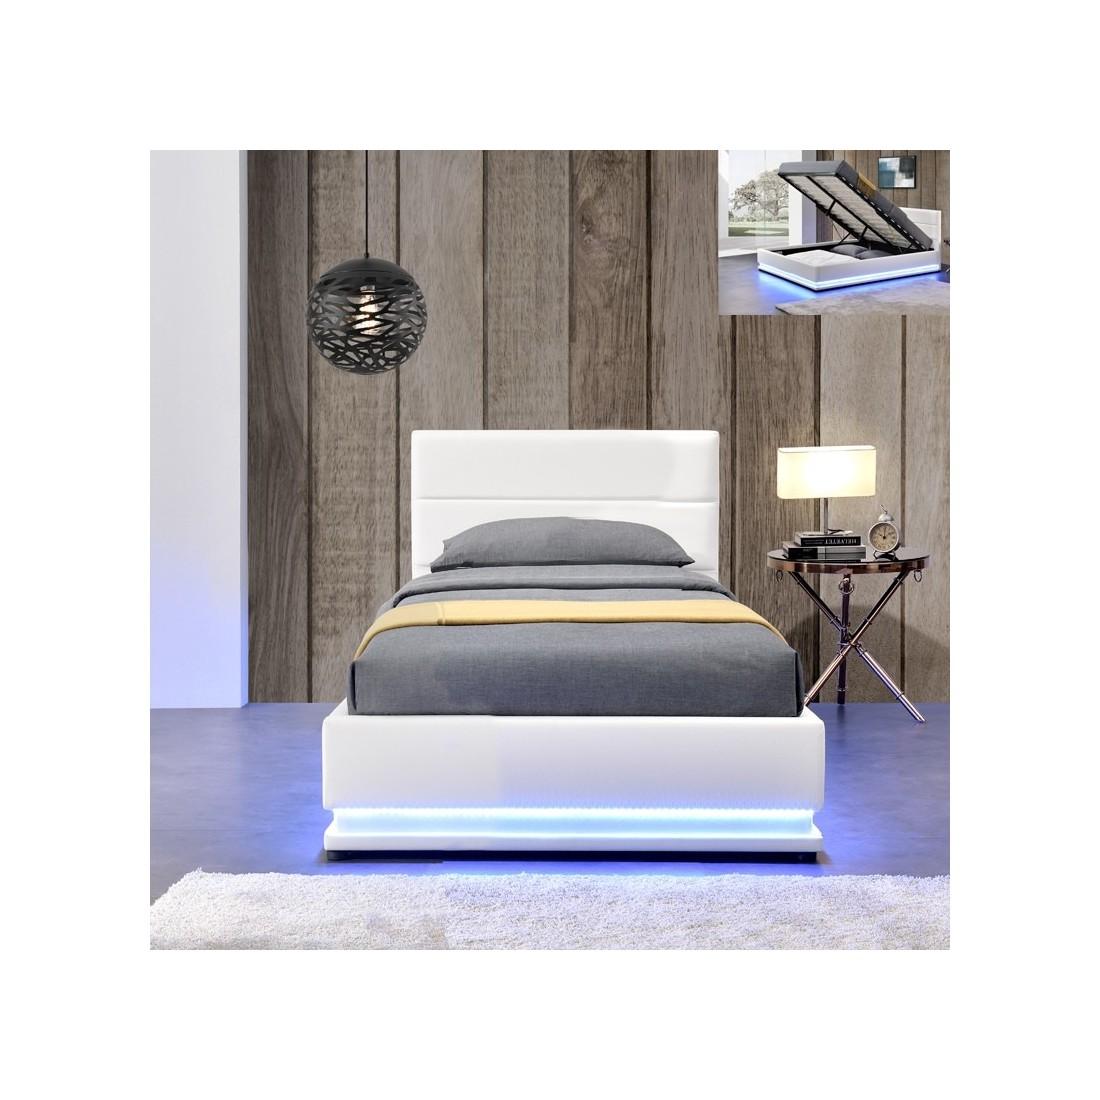 lit led avec sommier coffre de rangement ava meublerdesign. Black Bedroom Furniture Sets. Home Design Ideas